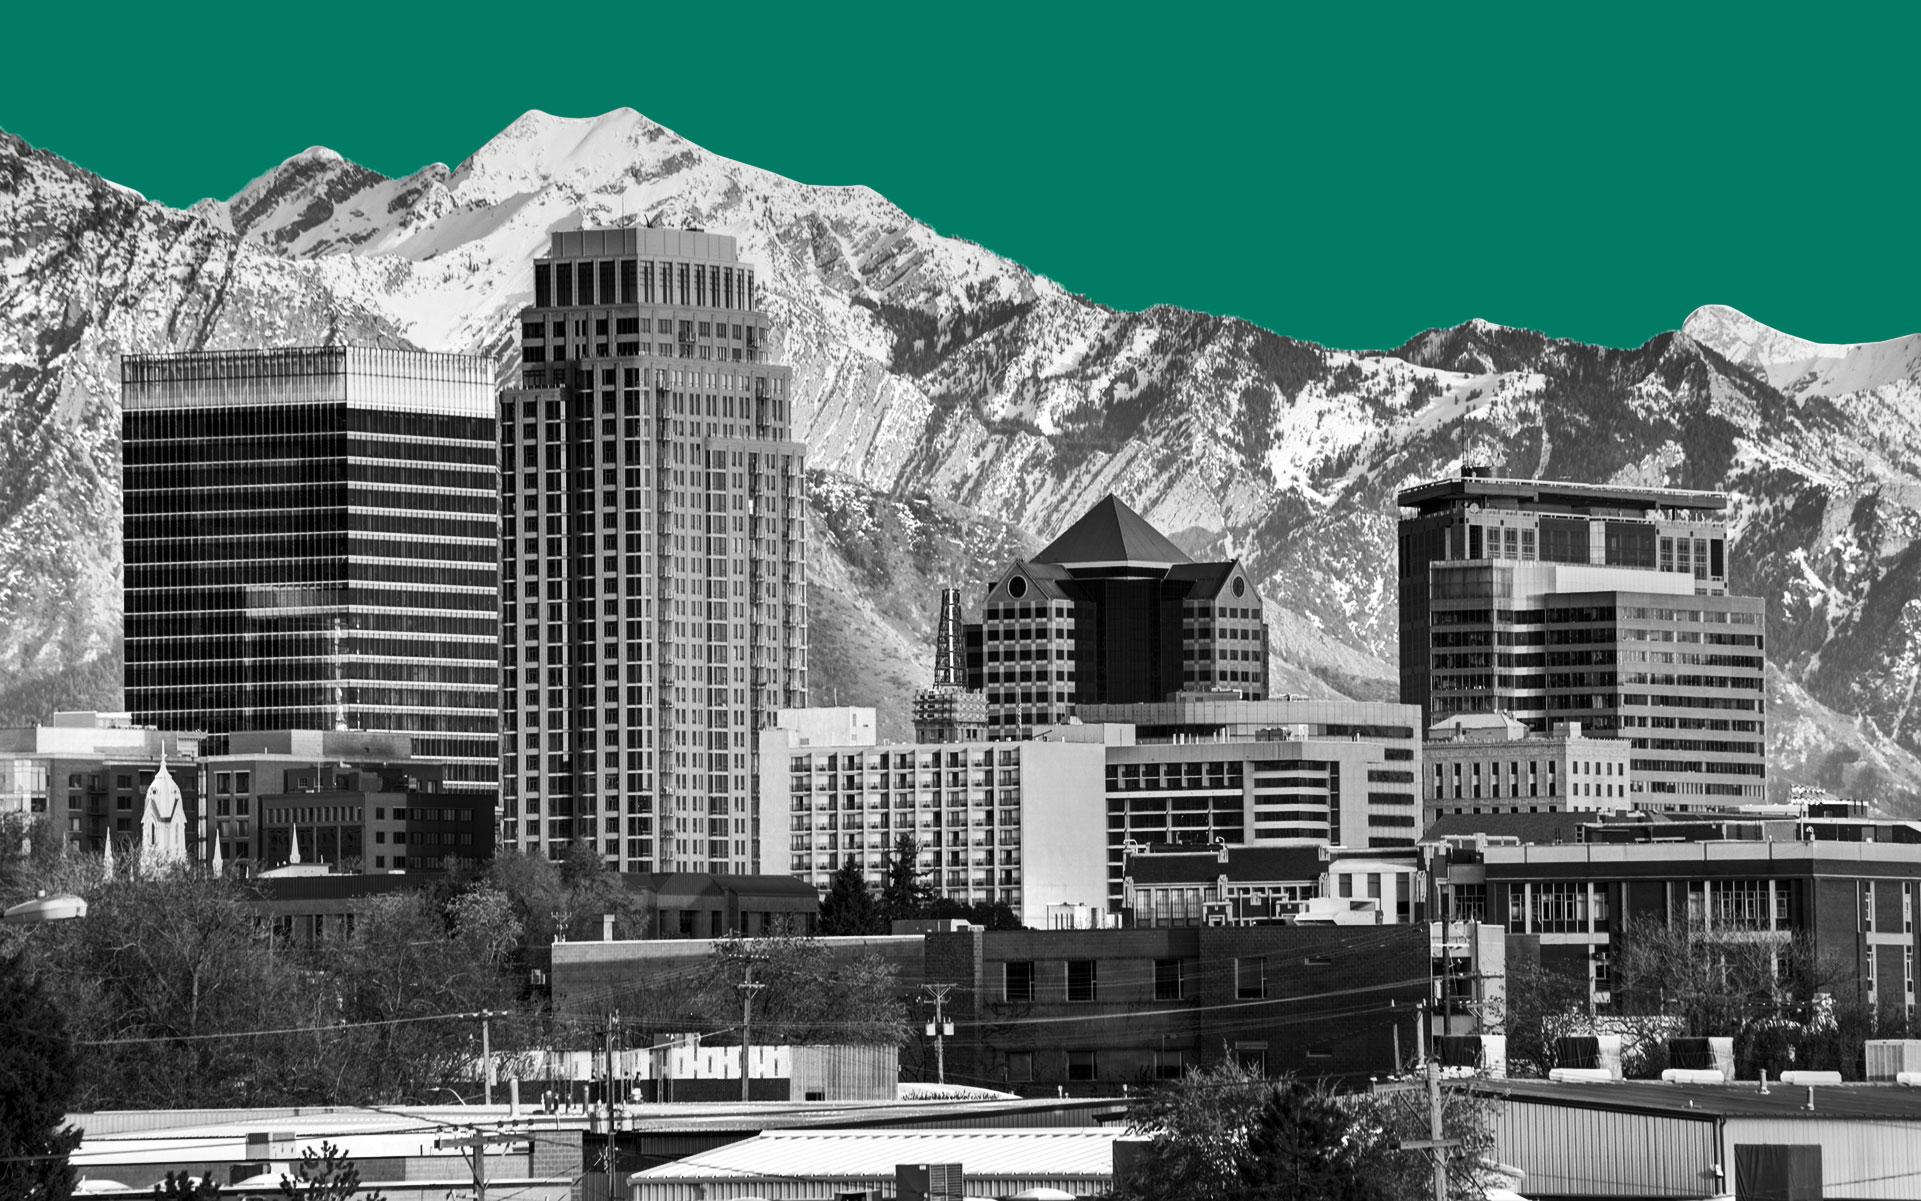 Utah cannabis legalization progress, utah marijuana legalization, salt lake city cannabis, new york legislature meeting on marijuana